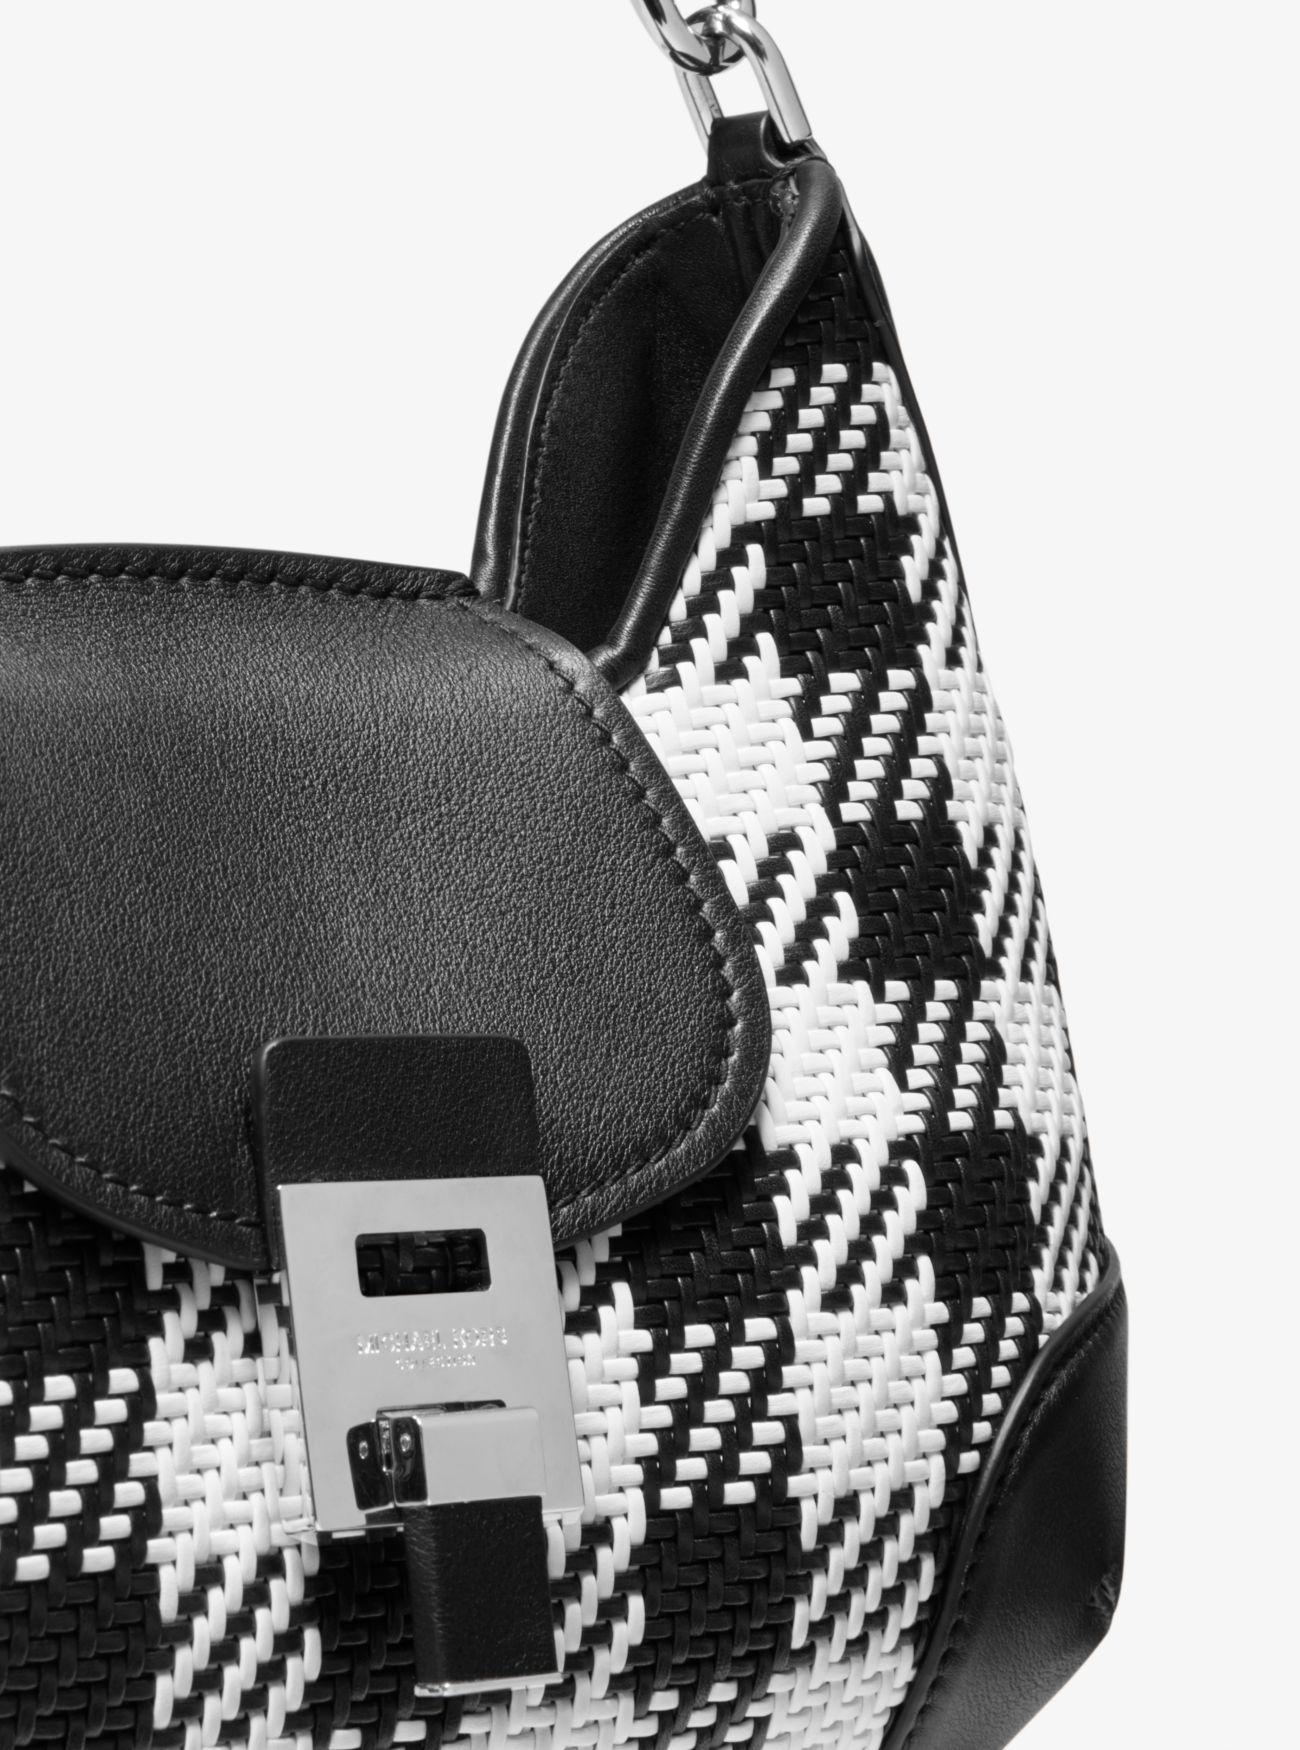 a644841aebbe4a Bancroft Medium Gingham Woven Calf Leather Shoulder Bag   Michael Kors